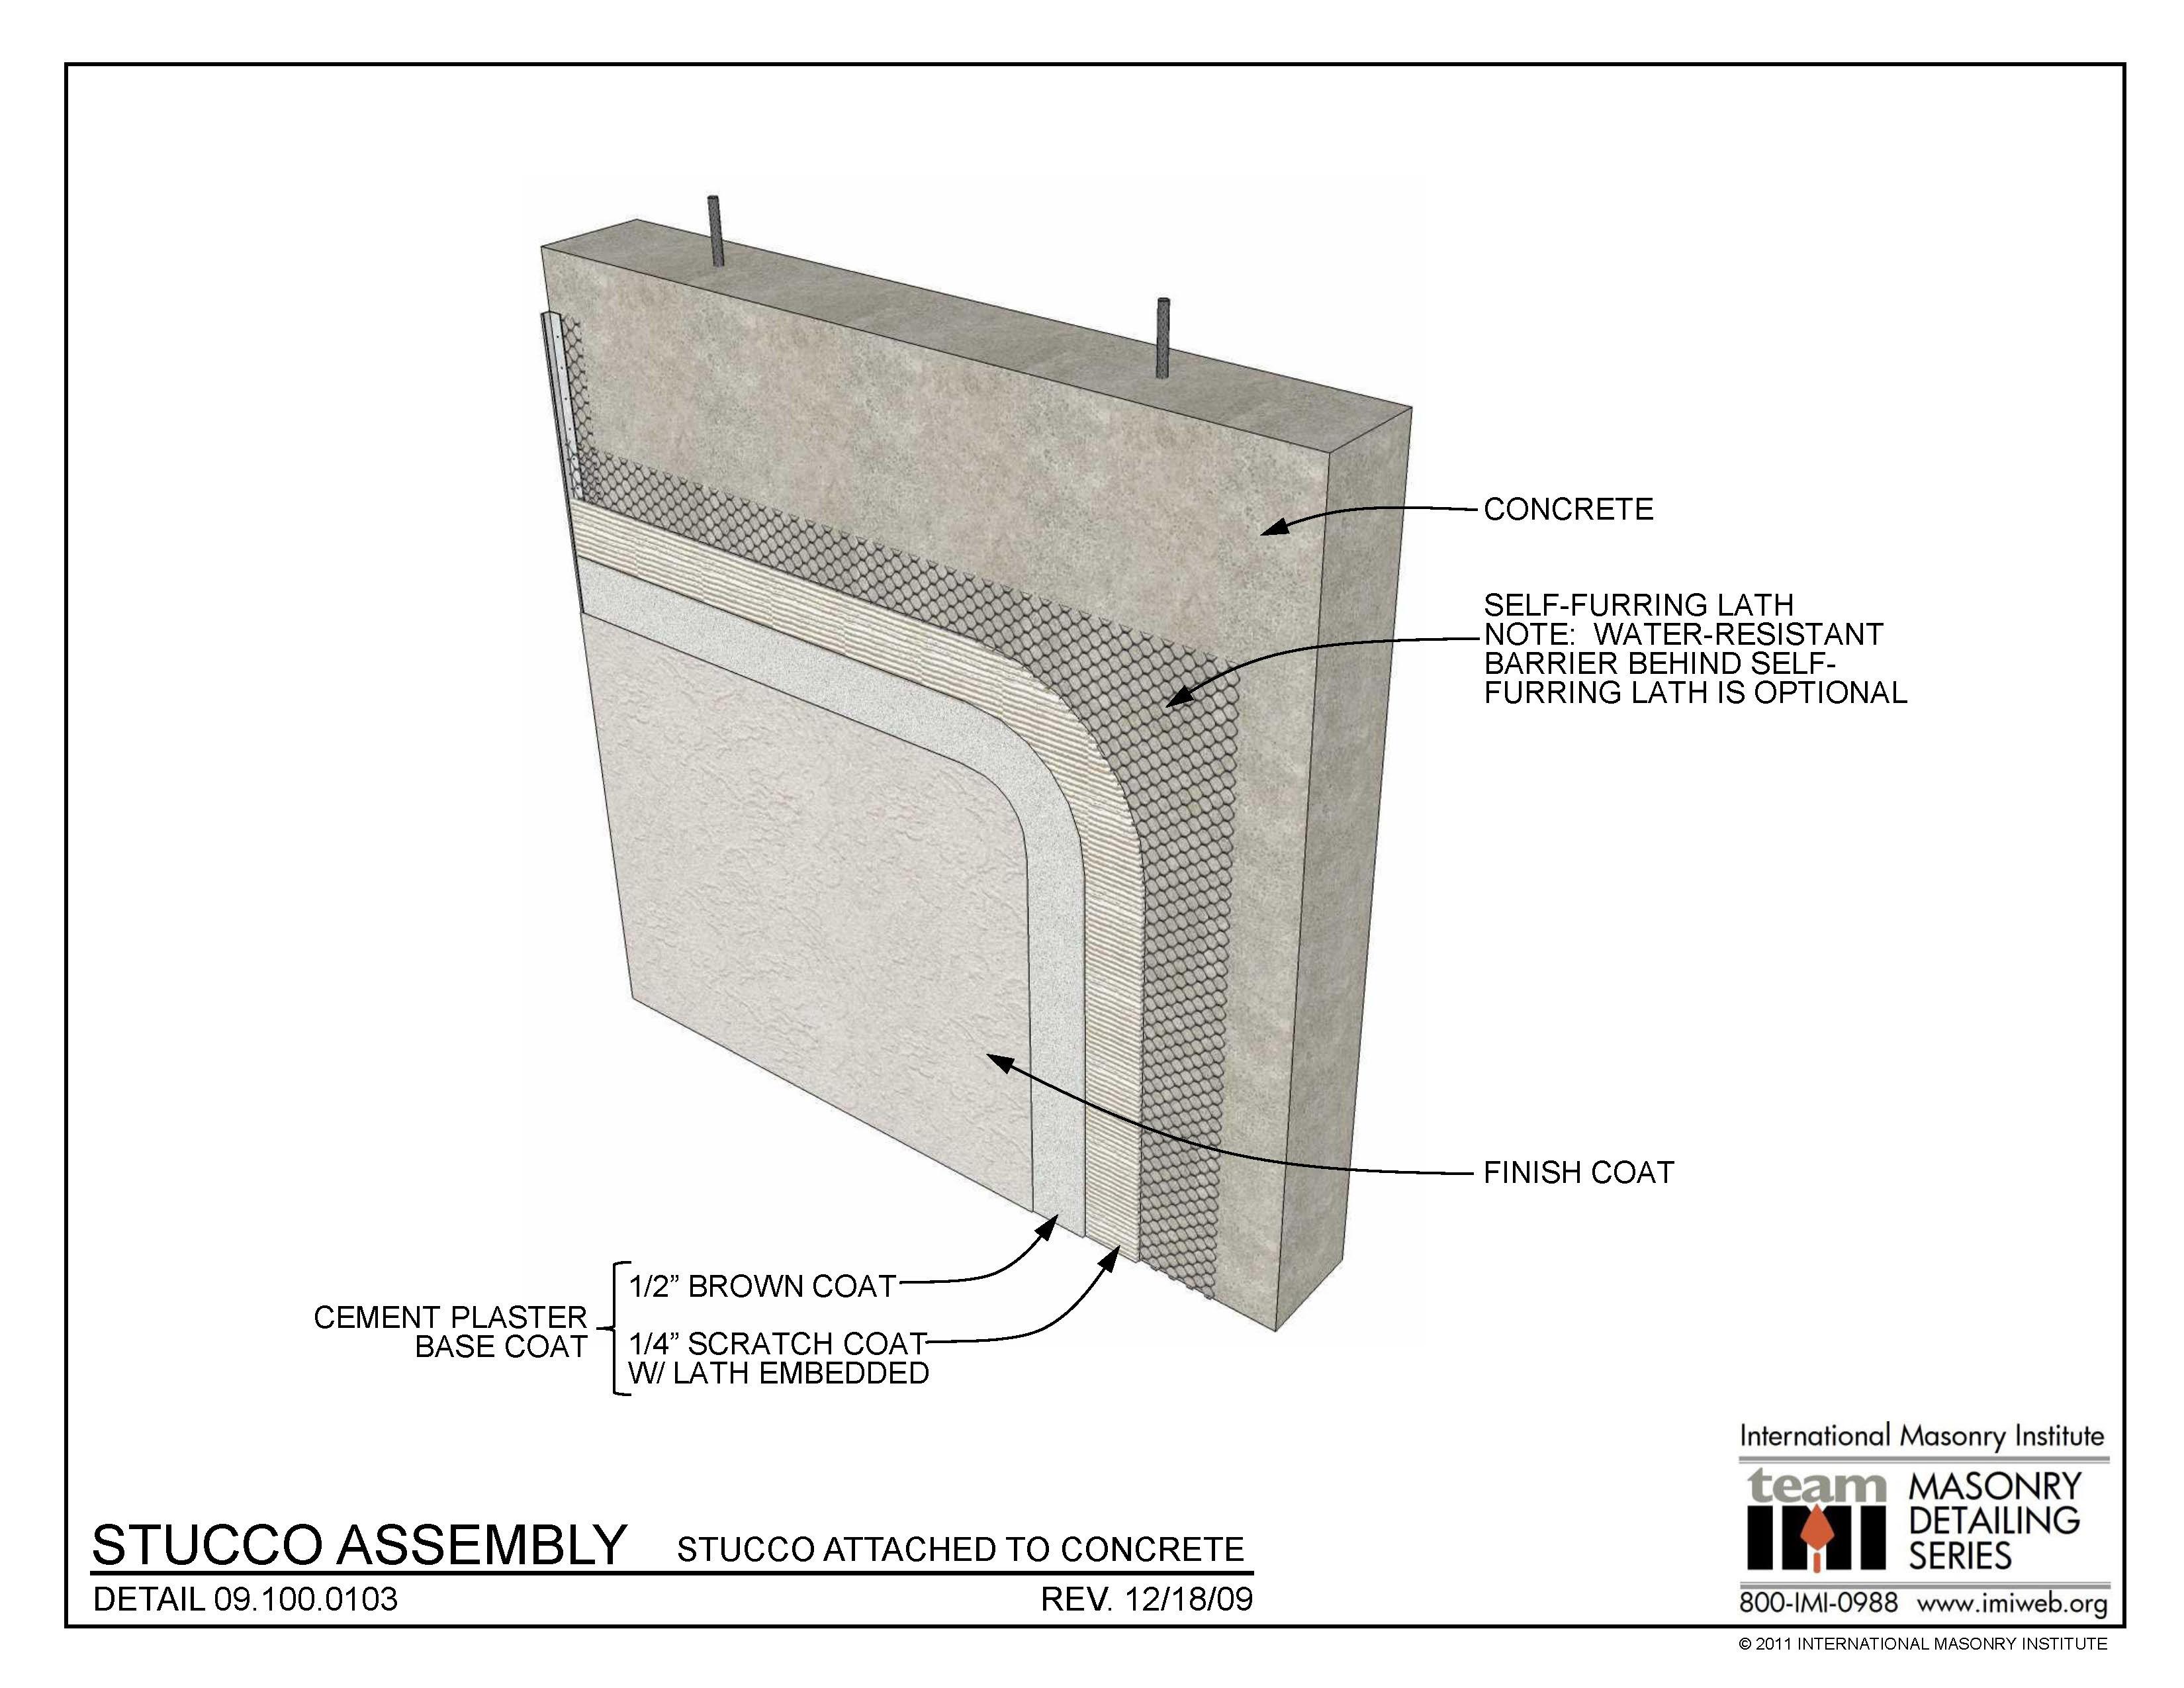 09 100 0103 Stucco Assembly International Masonry Institute